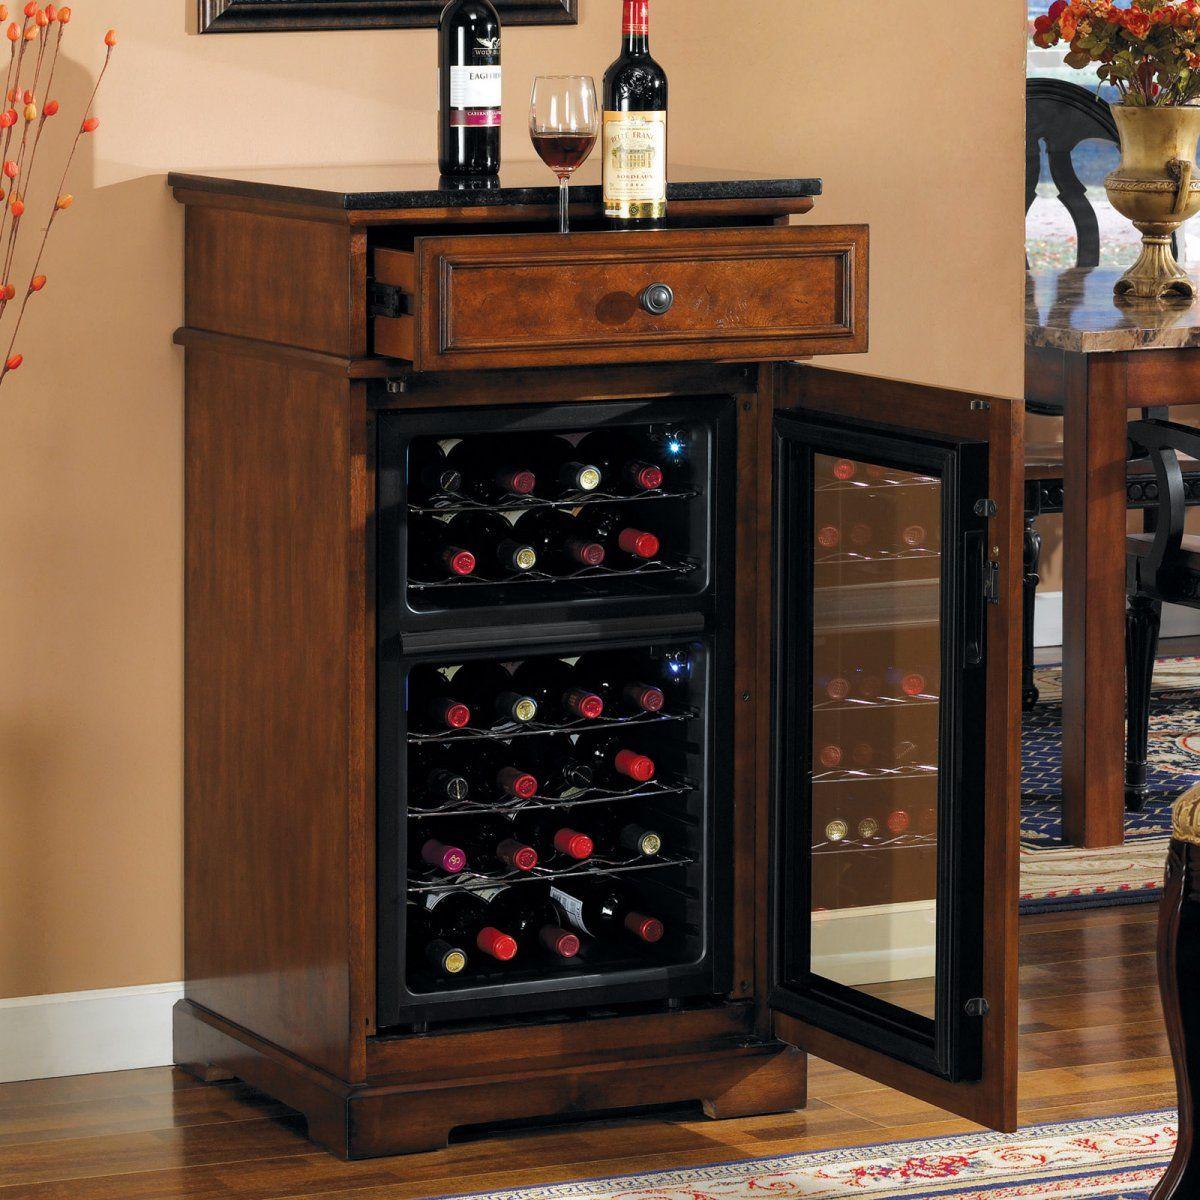 Tresanti Madison Dual Zone 24 Bottle Wine Cooler Wine Chiller Cabinet Wine Cabinets Built In Wine Cooler